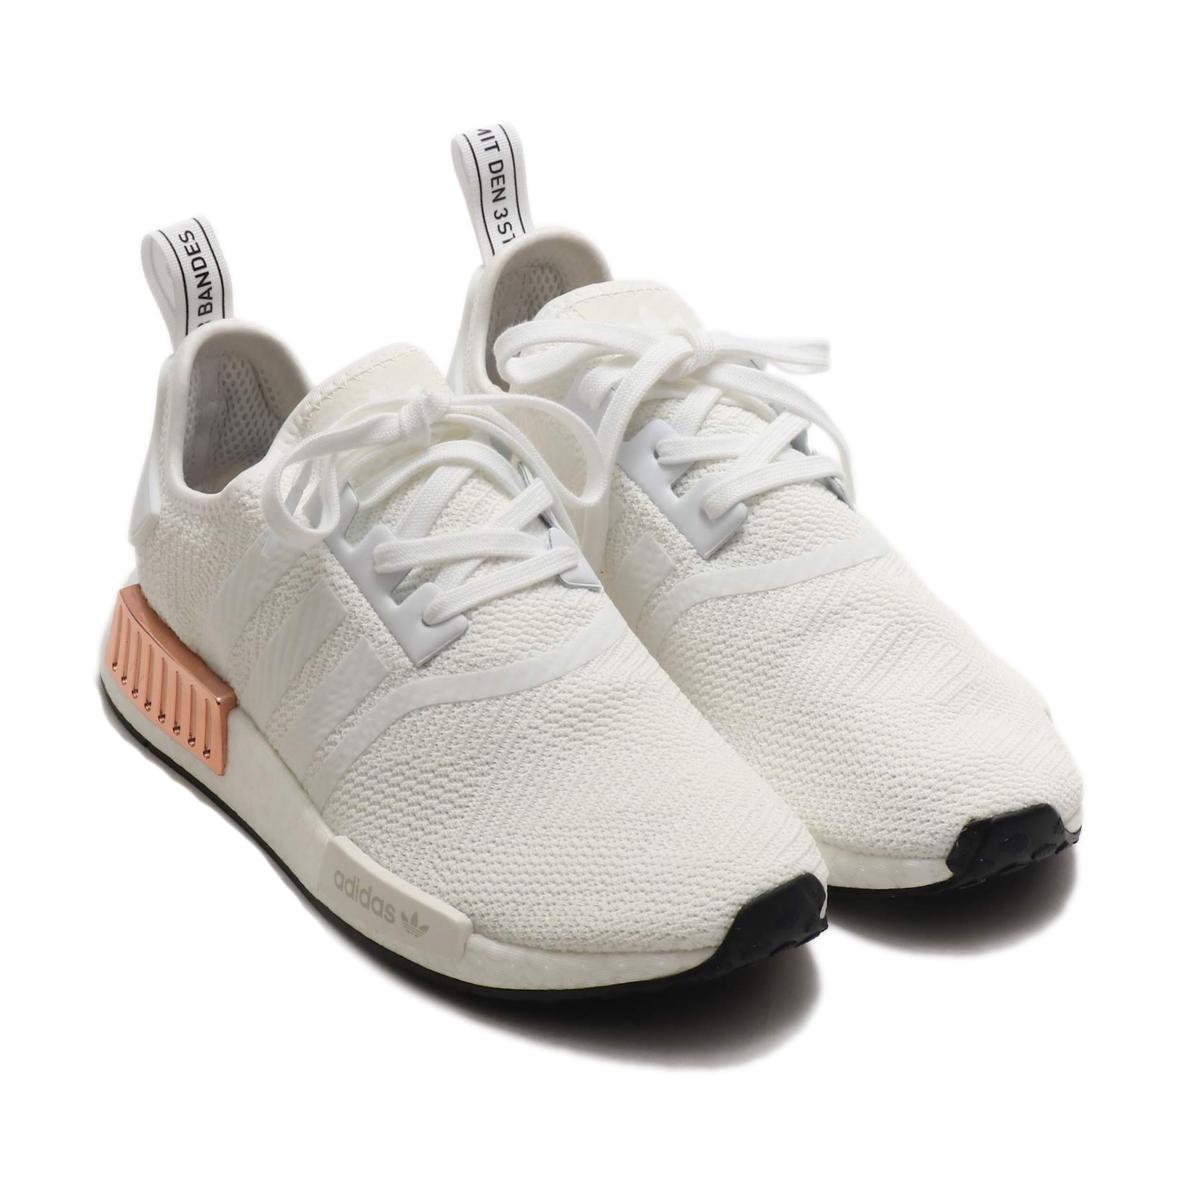 adidas Originals NMD_R1 W (RUNNING WHITERUNNING WHITECORE BLACK) (Adidas originals N M D R1 W)